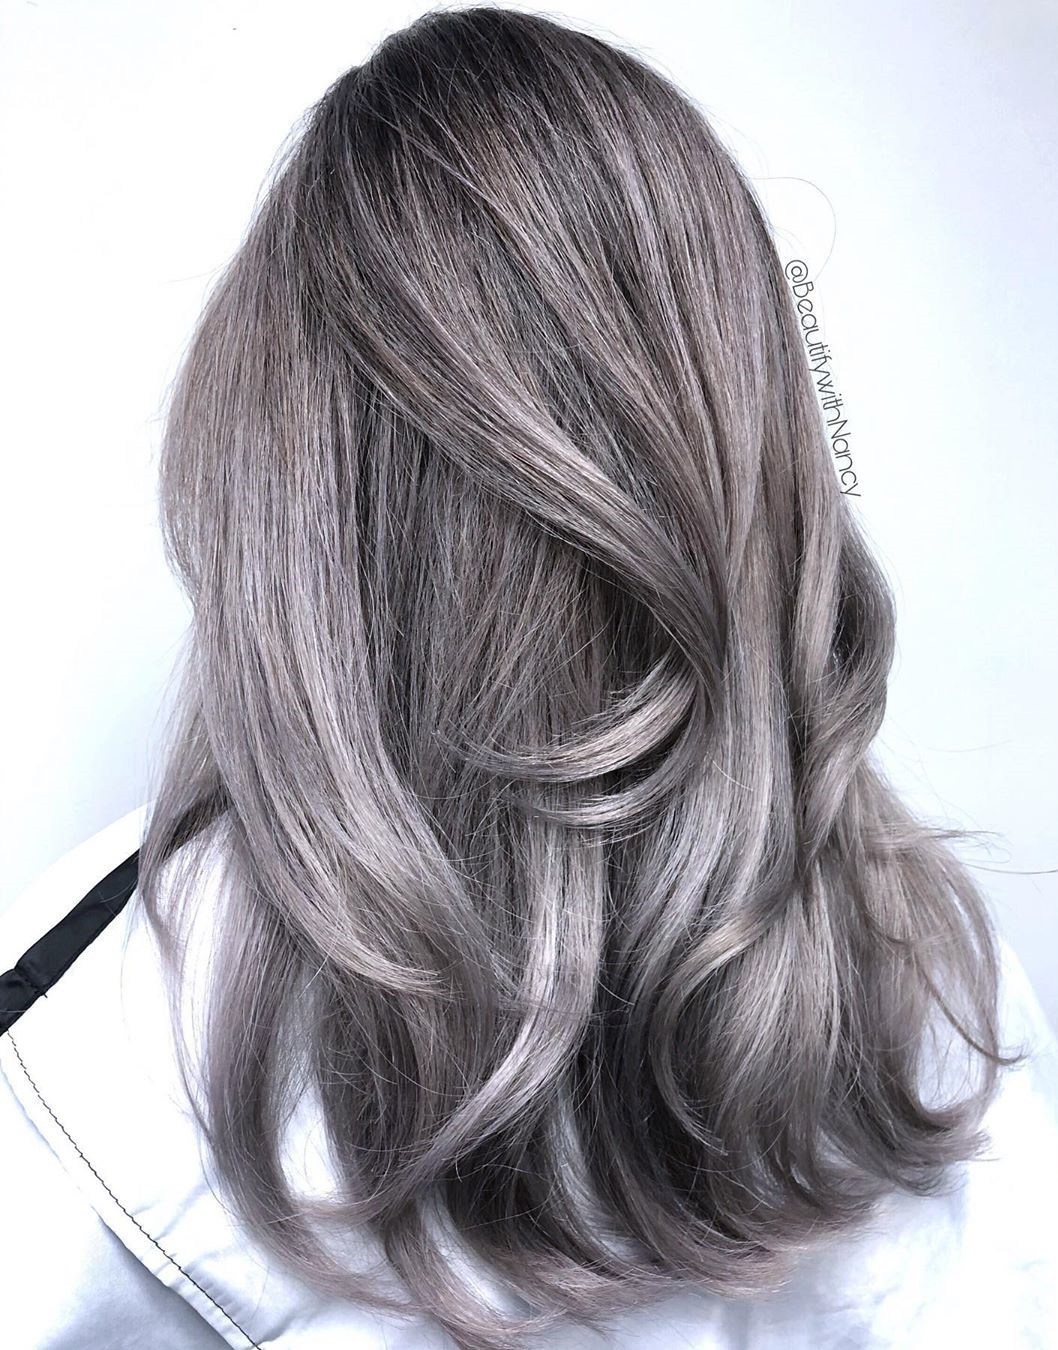 nhuộm tóc ombre màu xám khói